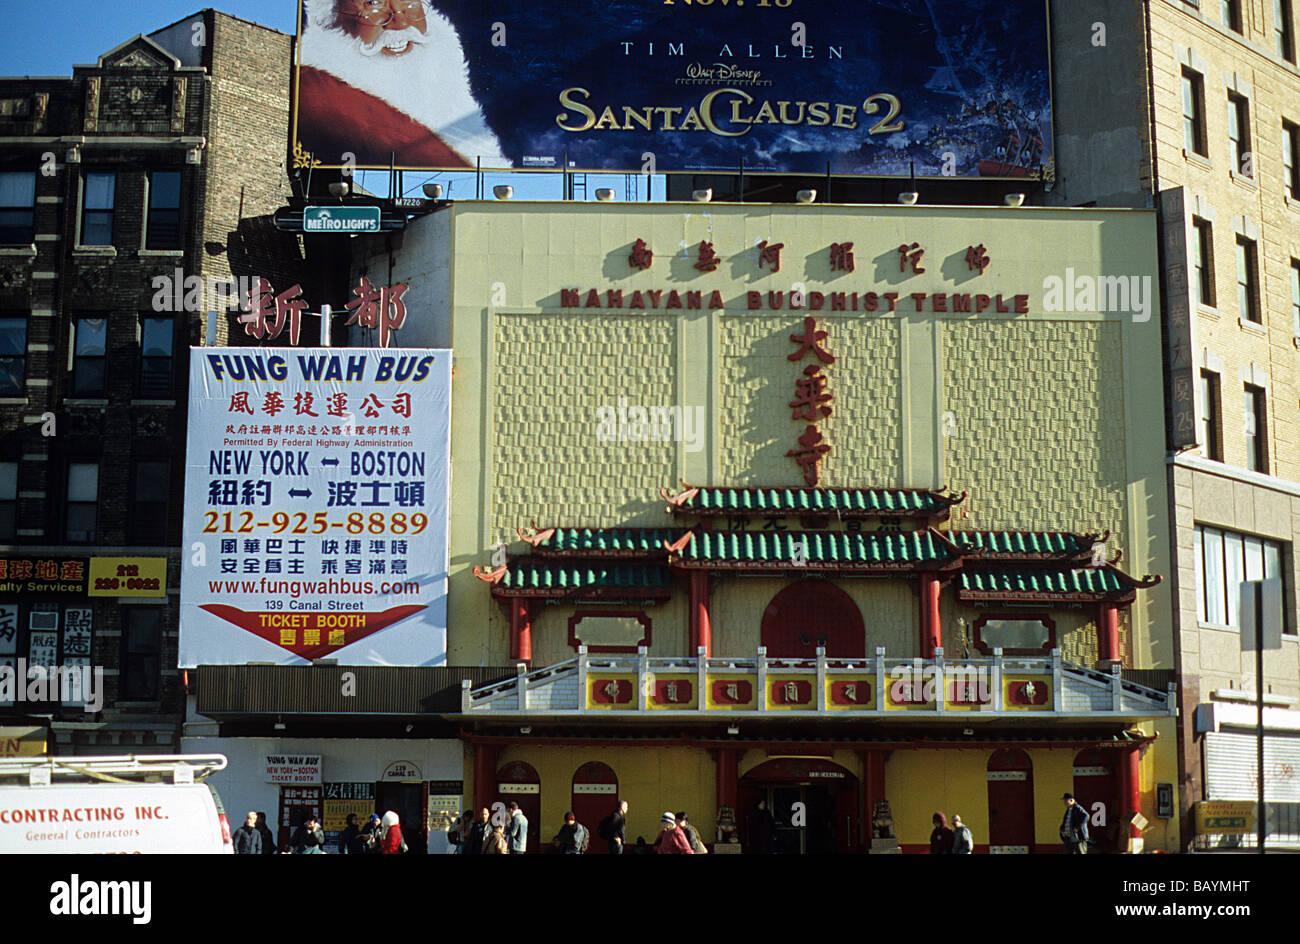 New York Mahayana Buddhist Temple Canal Street Facing Manhattan